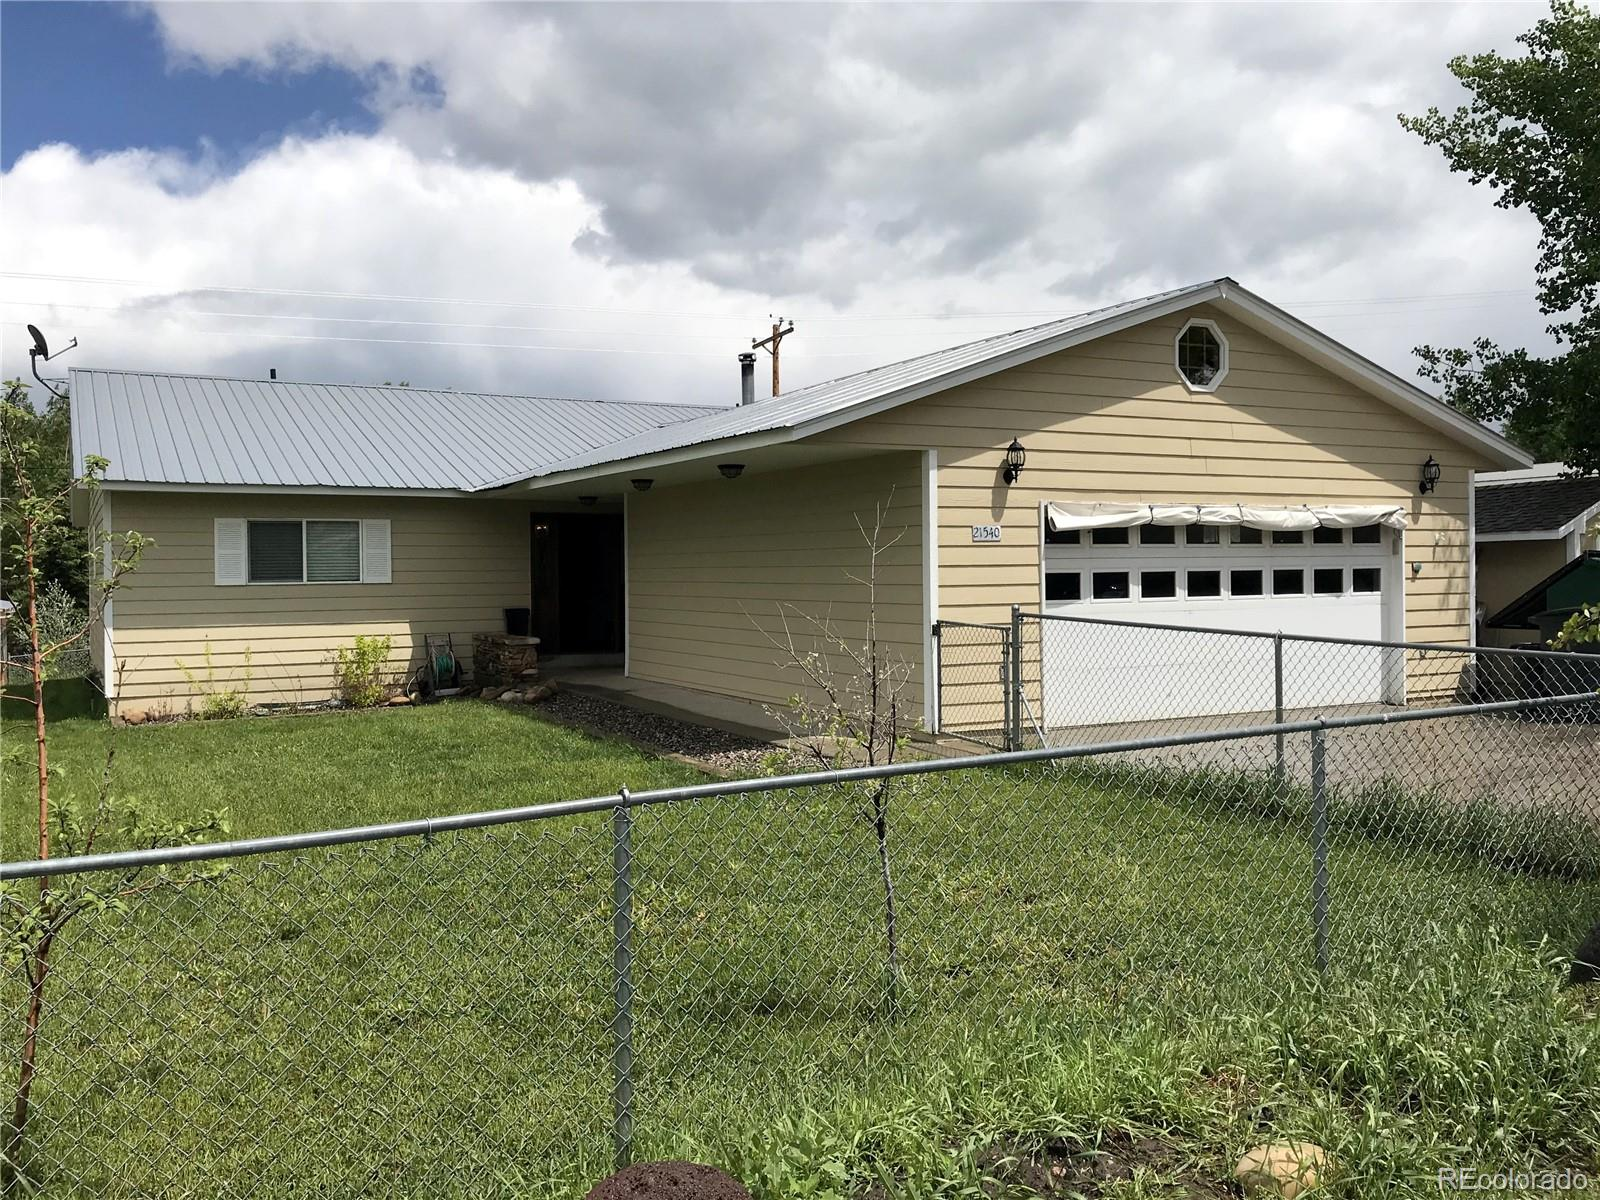 21540 4th Avenue, Phippsburg, CO 80469 - Phippsburg, CO real estate listing